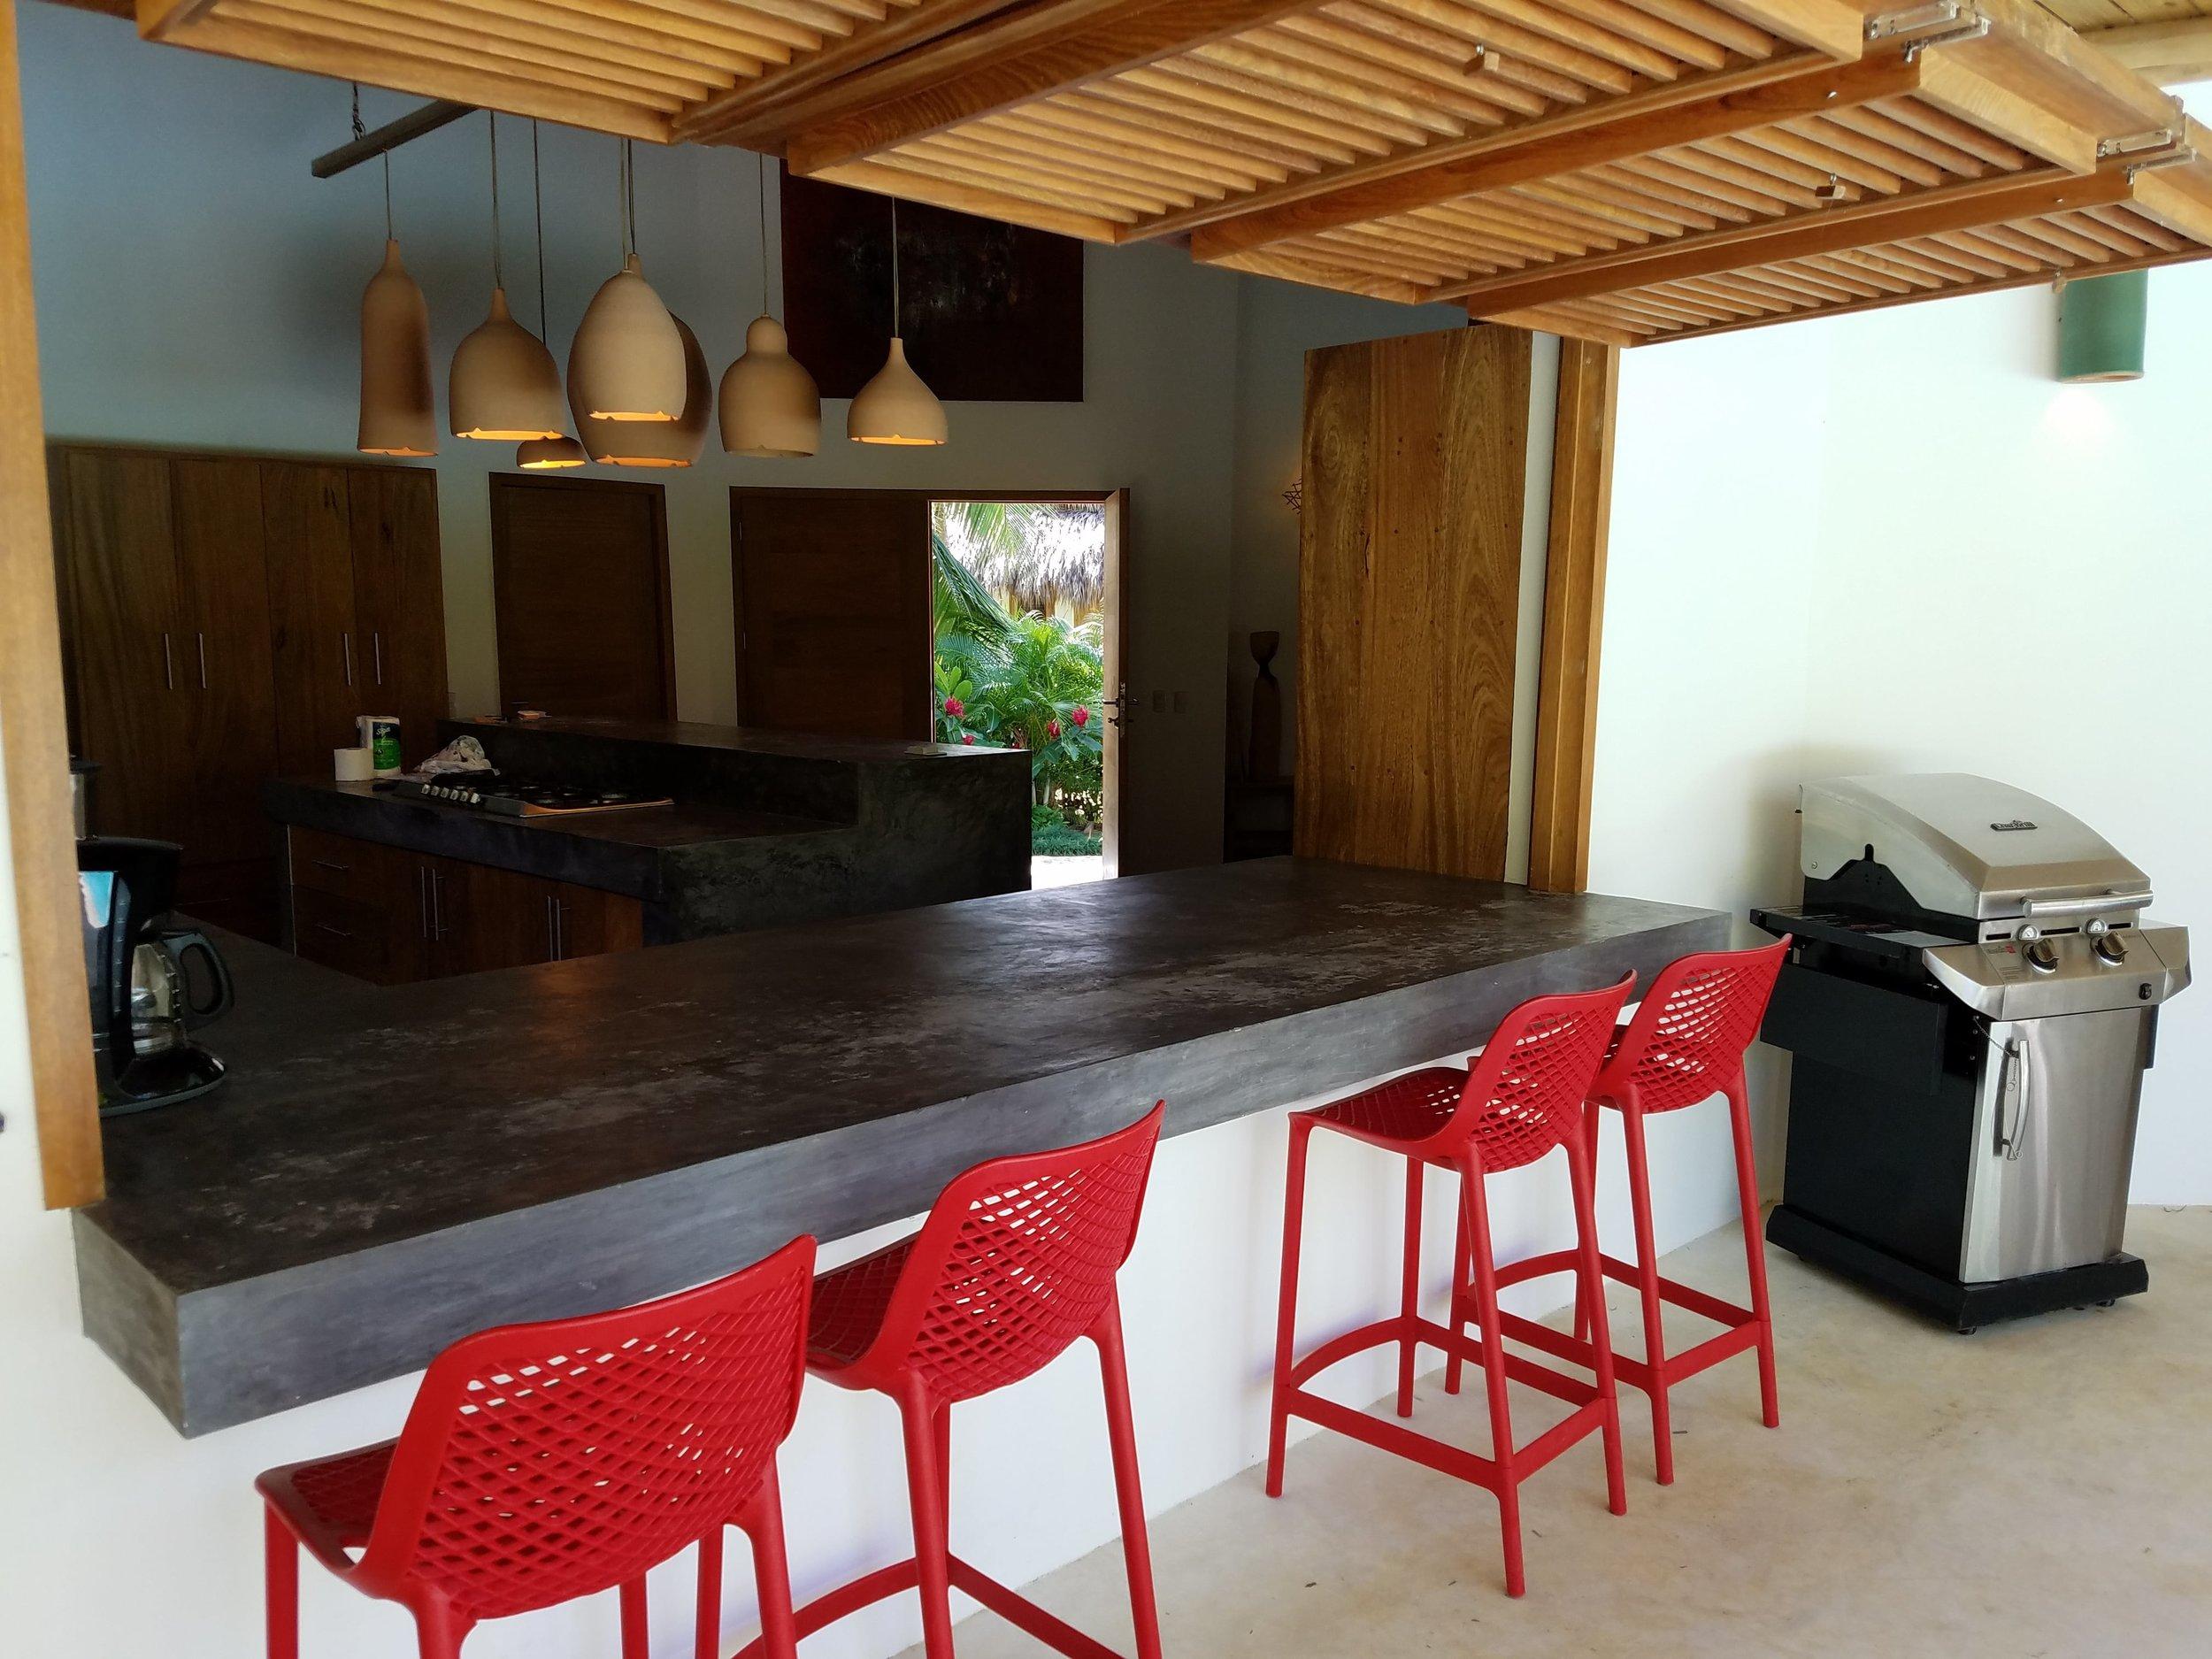 Villa for rent Las Terrenas Cote ci cote la4-min.jpg